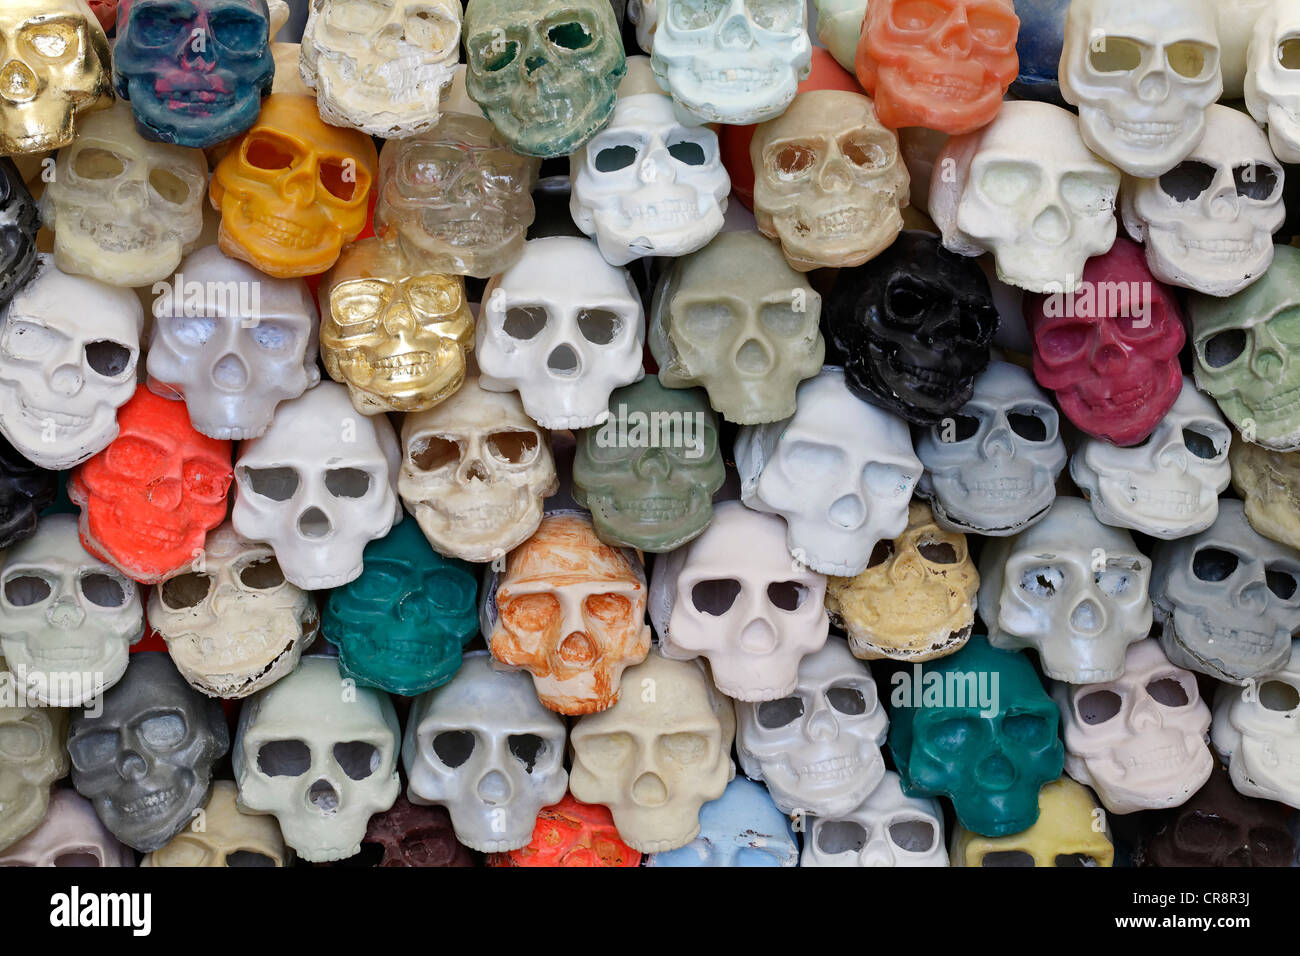 Colorfully painted plastic skulls, art work, exhibition of student works, Kunstakademie Duesseldorf arts academy - Stock Image